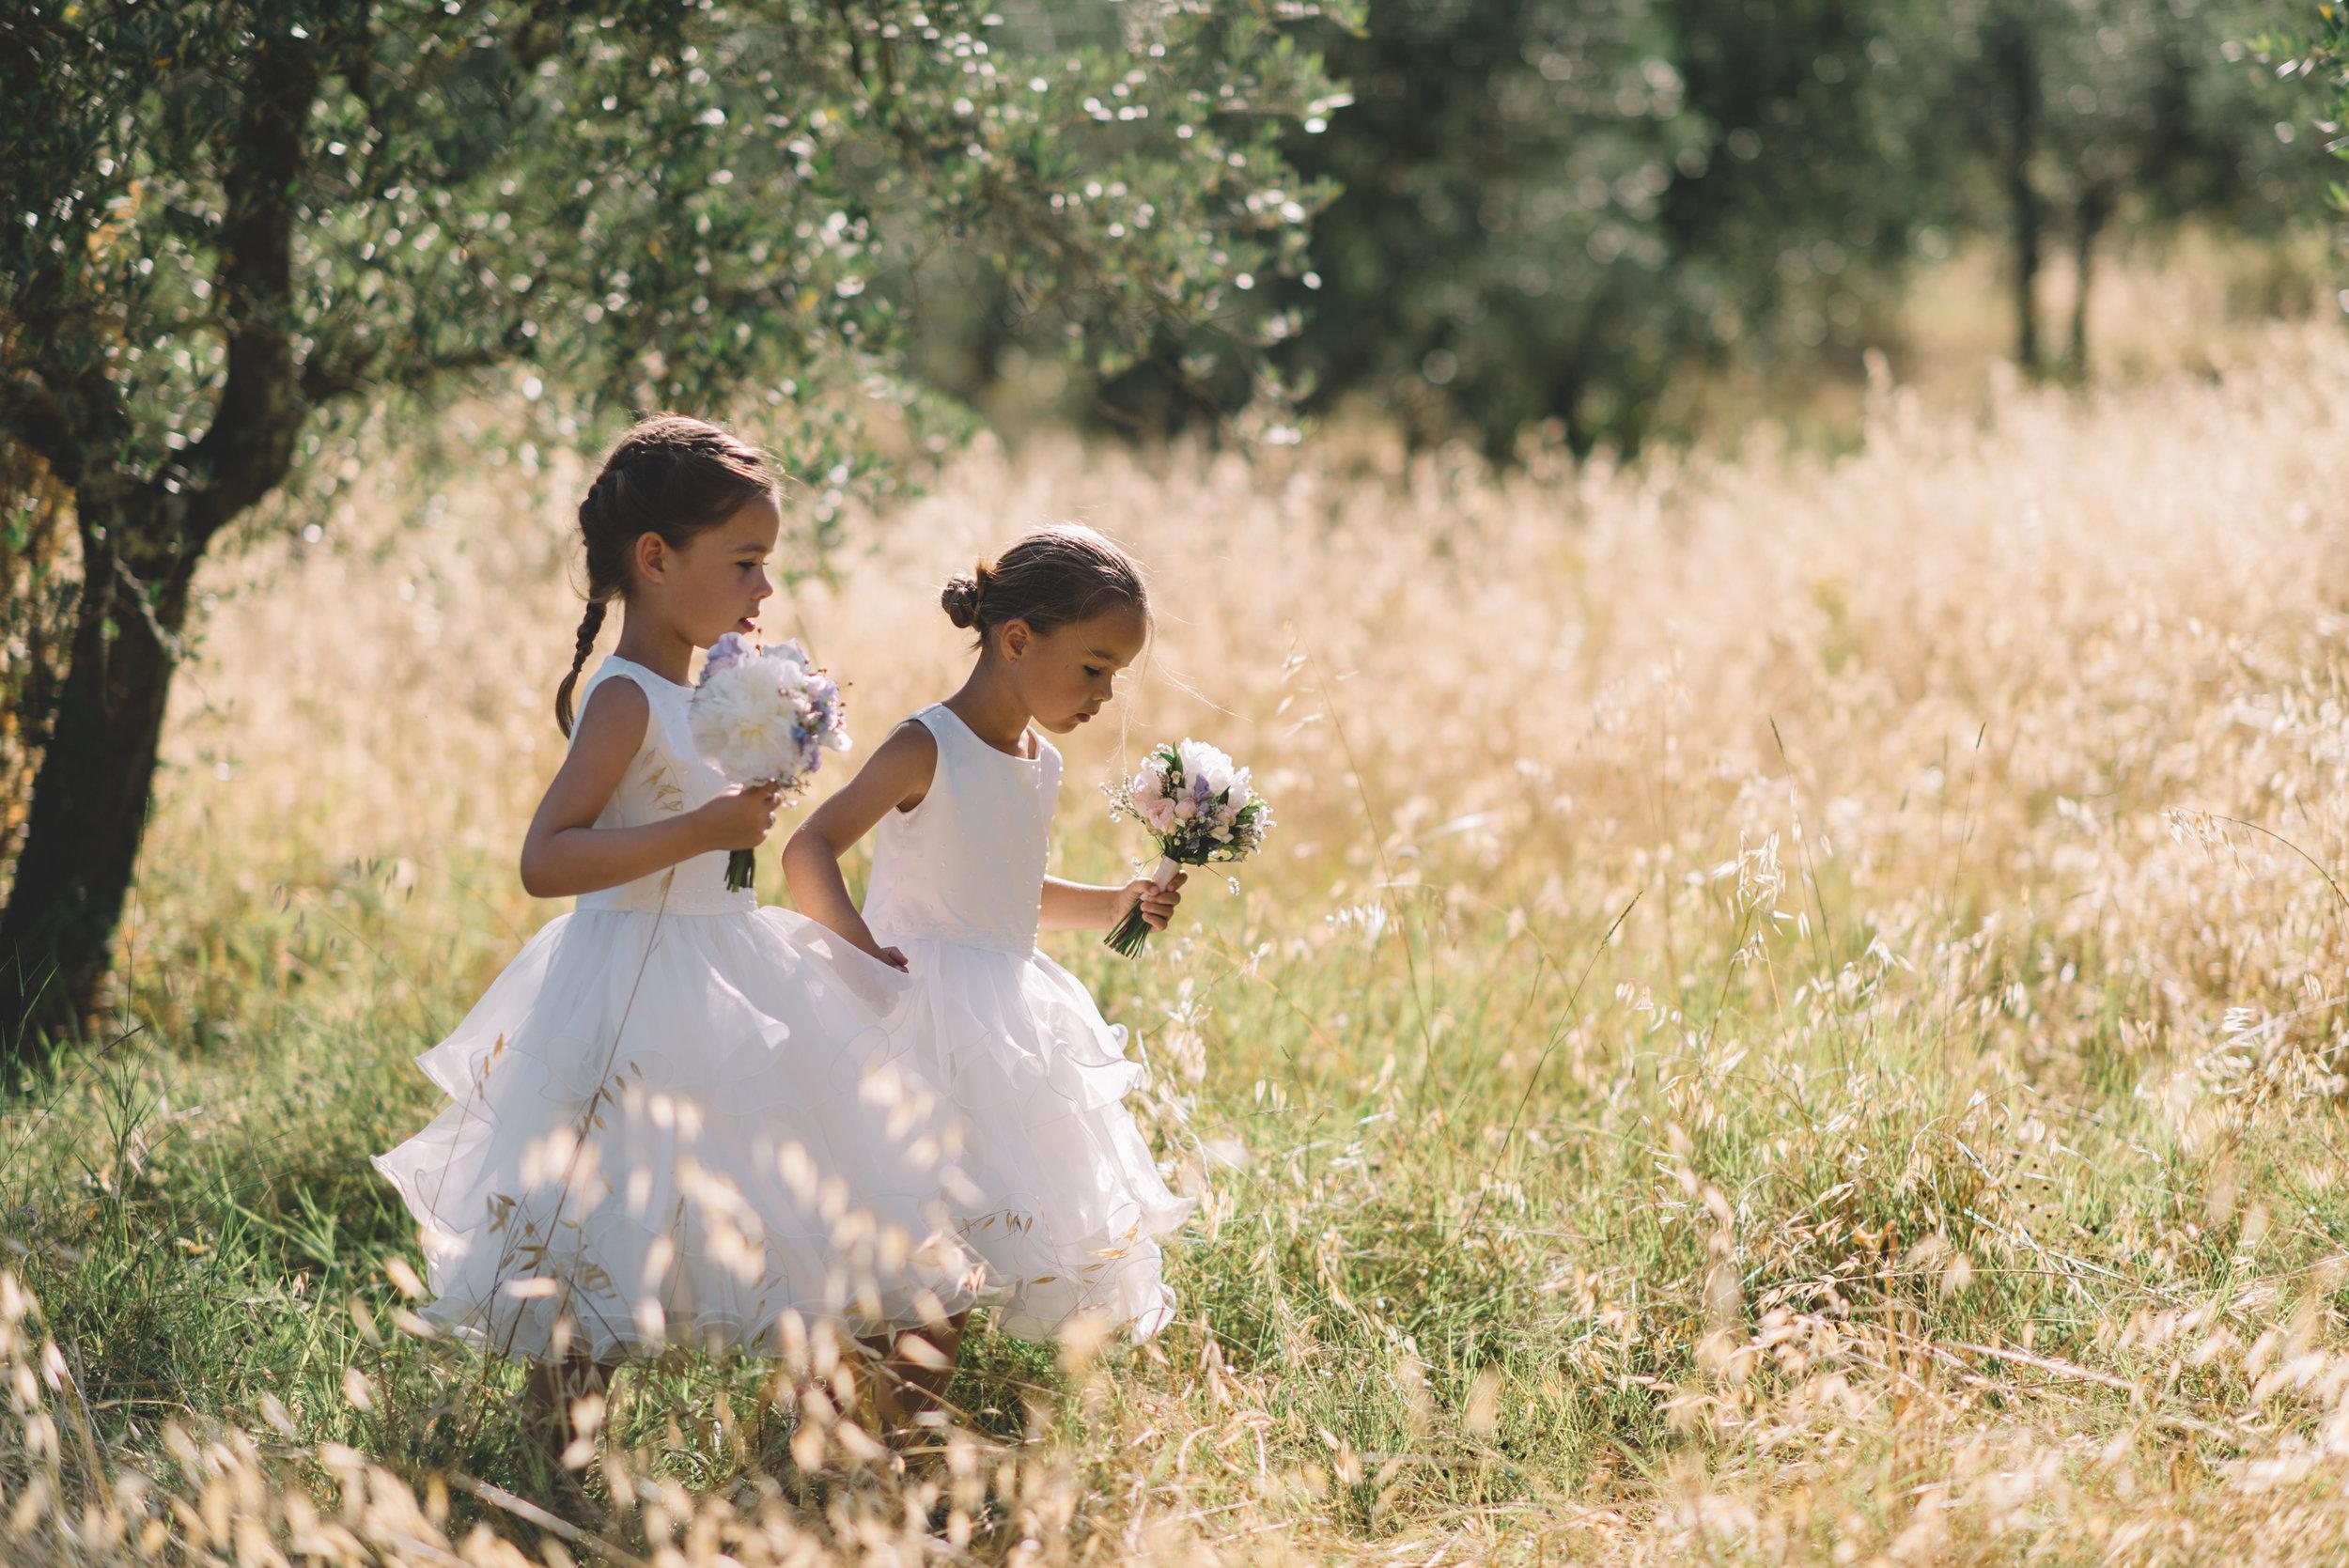 Wedding_Photographer_Tuscany_Italy_17.jpg